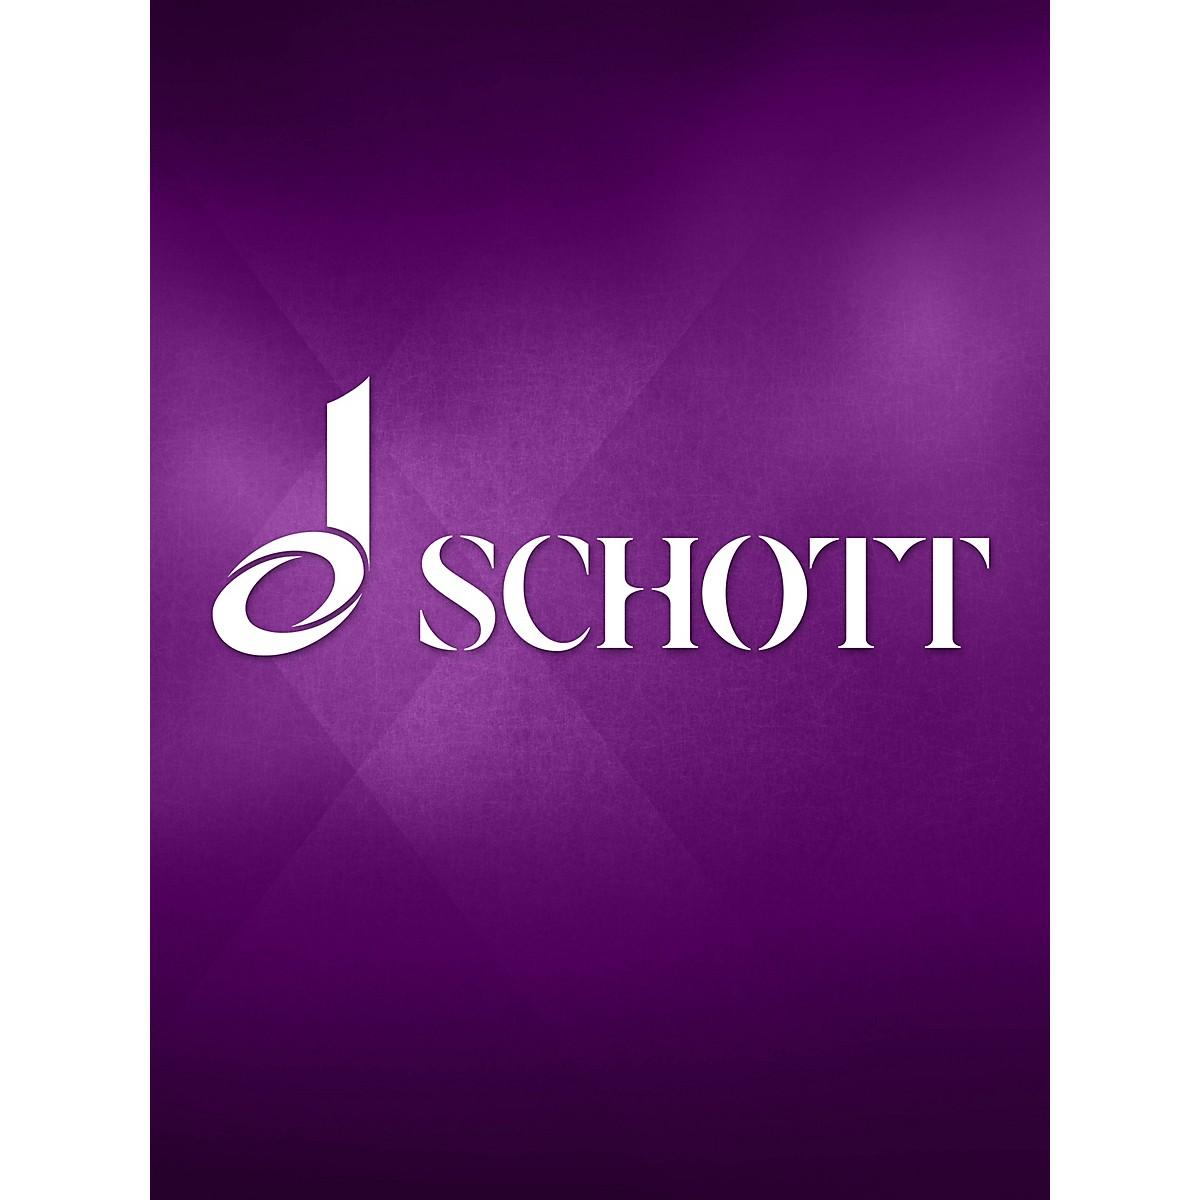 Schott Music Trio-Cosmos No. 12 (Violin 3 Part) Schott Series Composed by Henk Badings